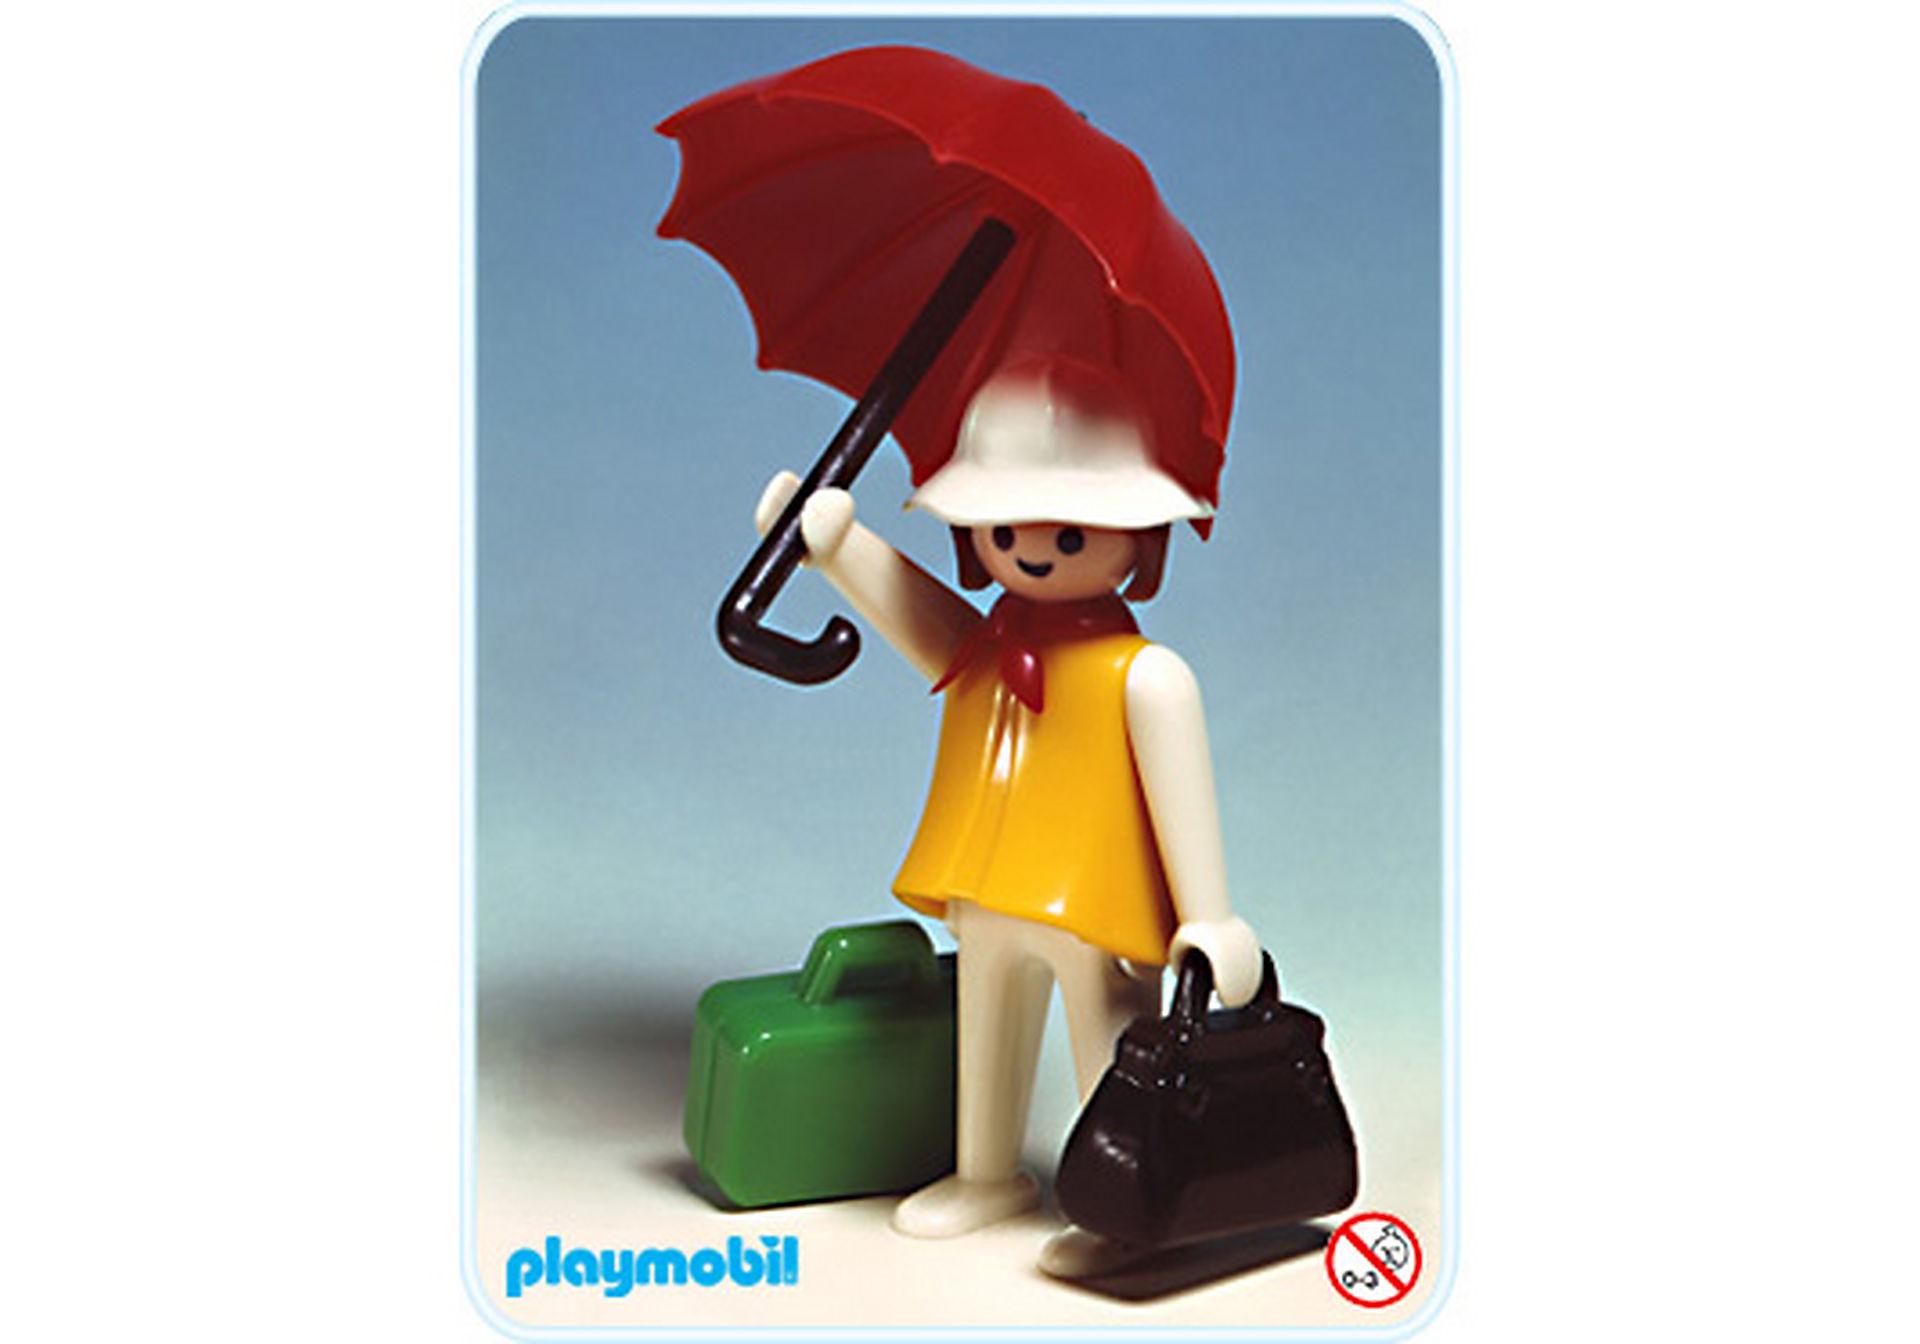 http://media.playmobil.com/i/playmobil/3322-B_product_detail/Voyageuse/ parapluie